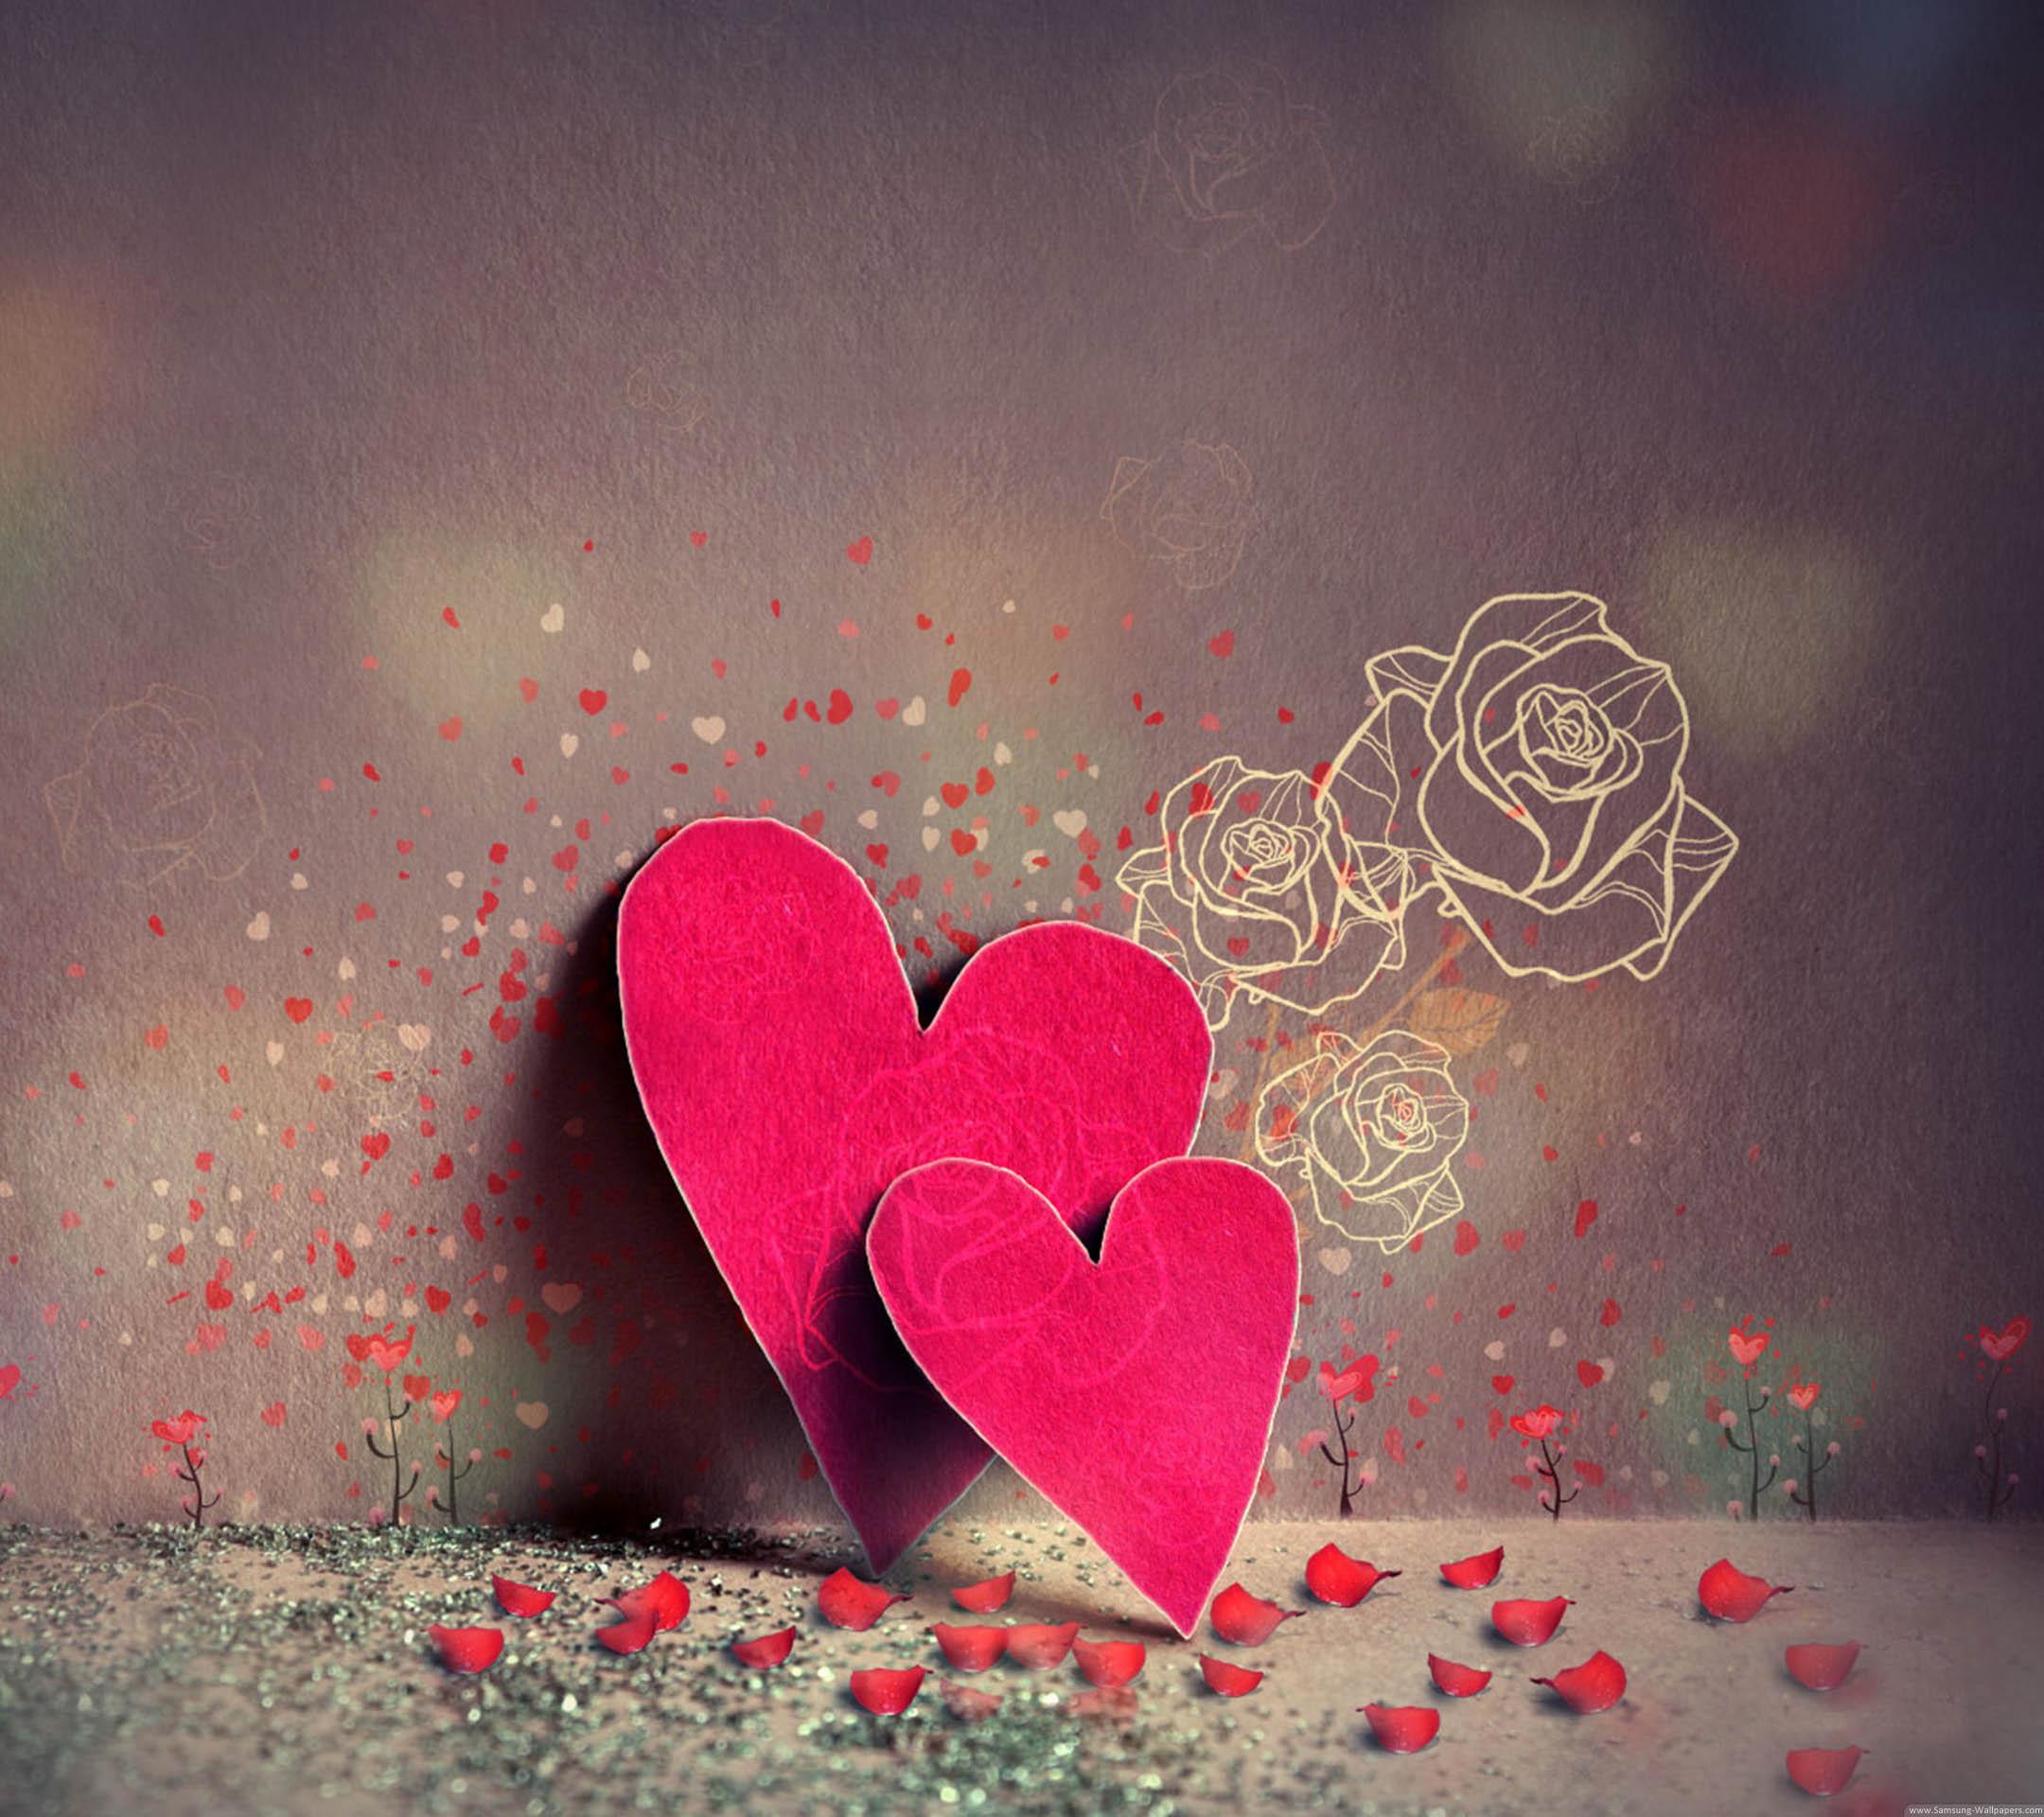 Wallpapers Of Love: Love Screen Wallpaper